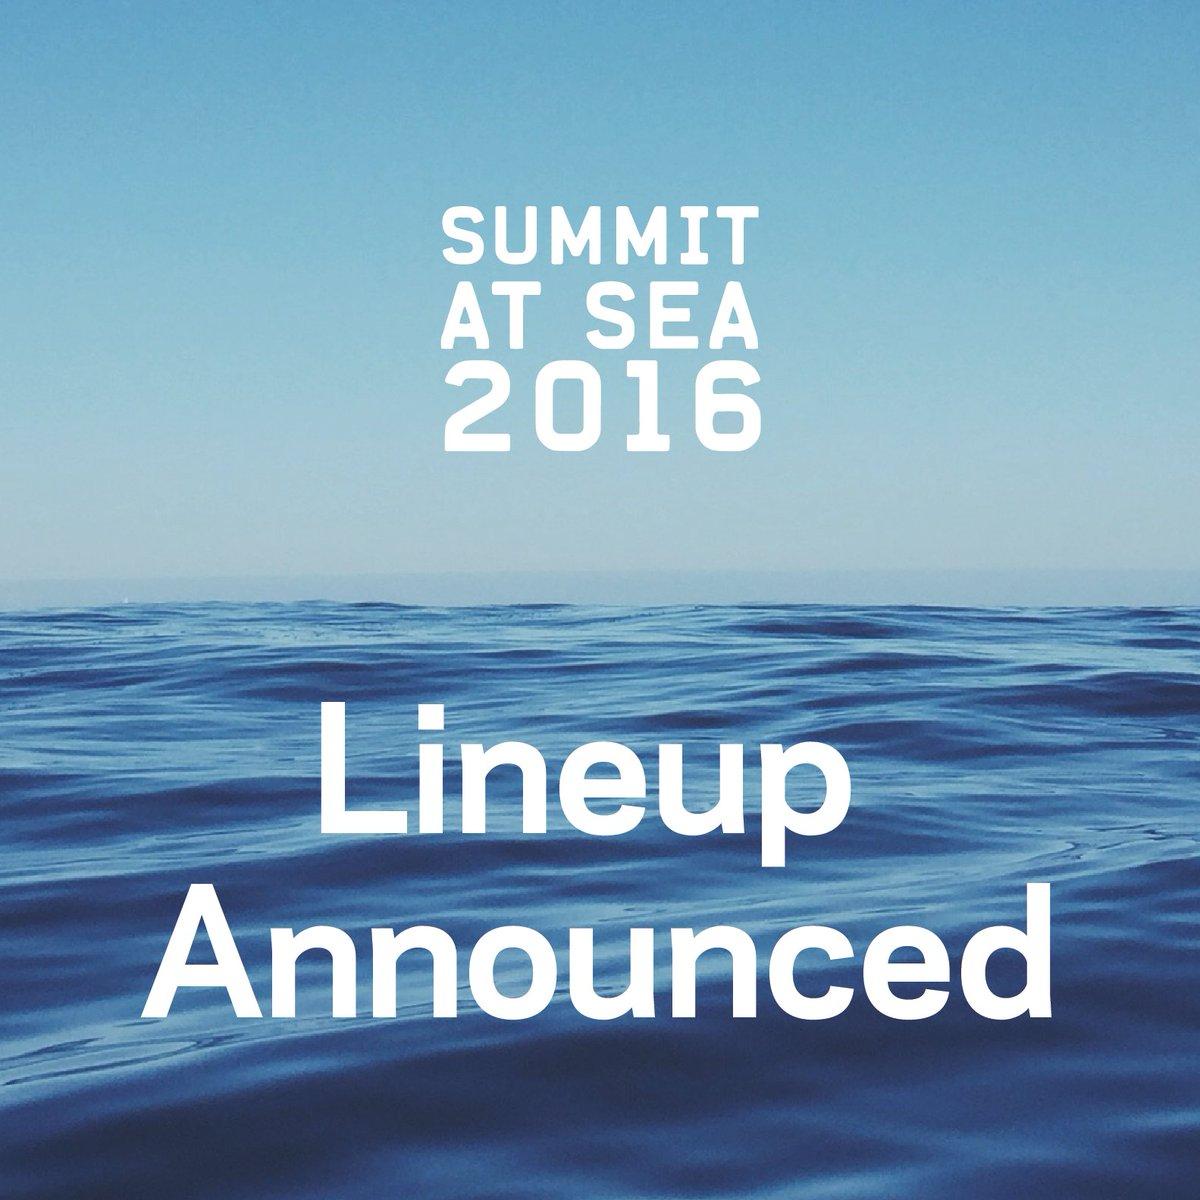 #sas2016 lineup announced! We're thrilled to unveil an unprecedented immersive experience. https://t.co/2kvdcdQDu6 https://t.co/4JSjxmmv8c